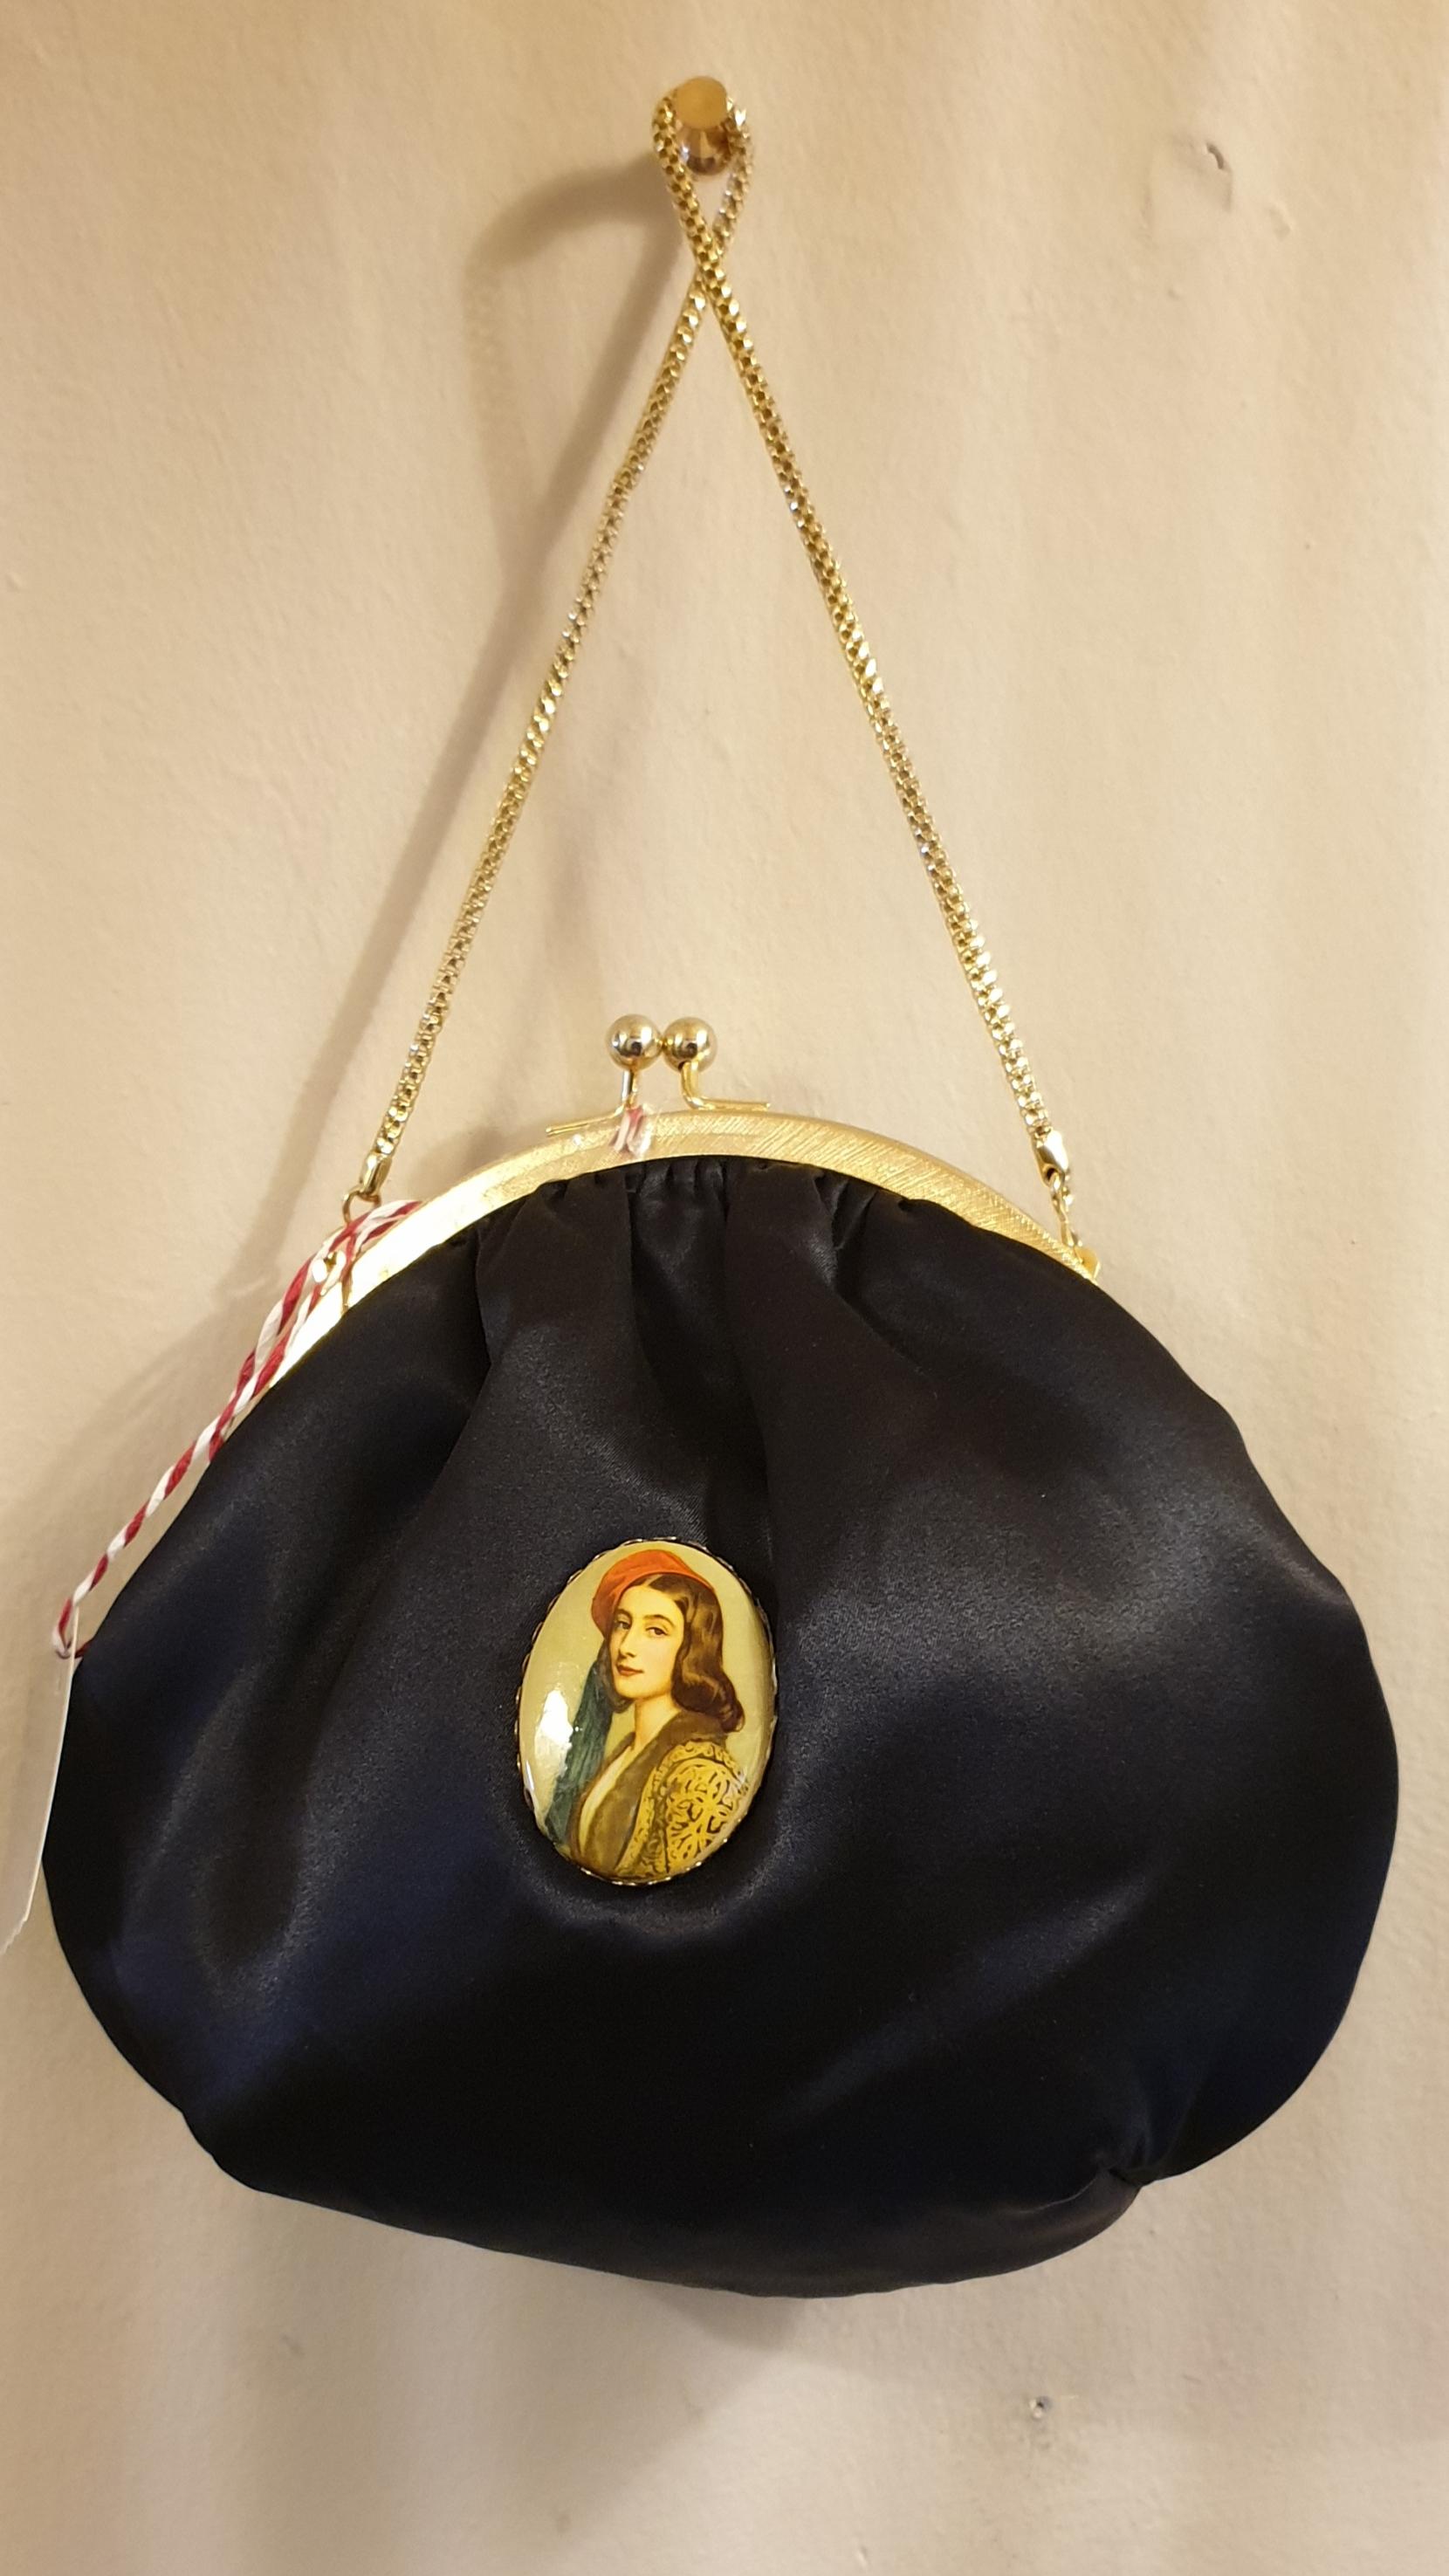 Black satin wrist bag